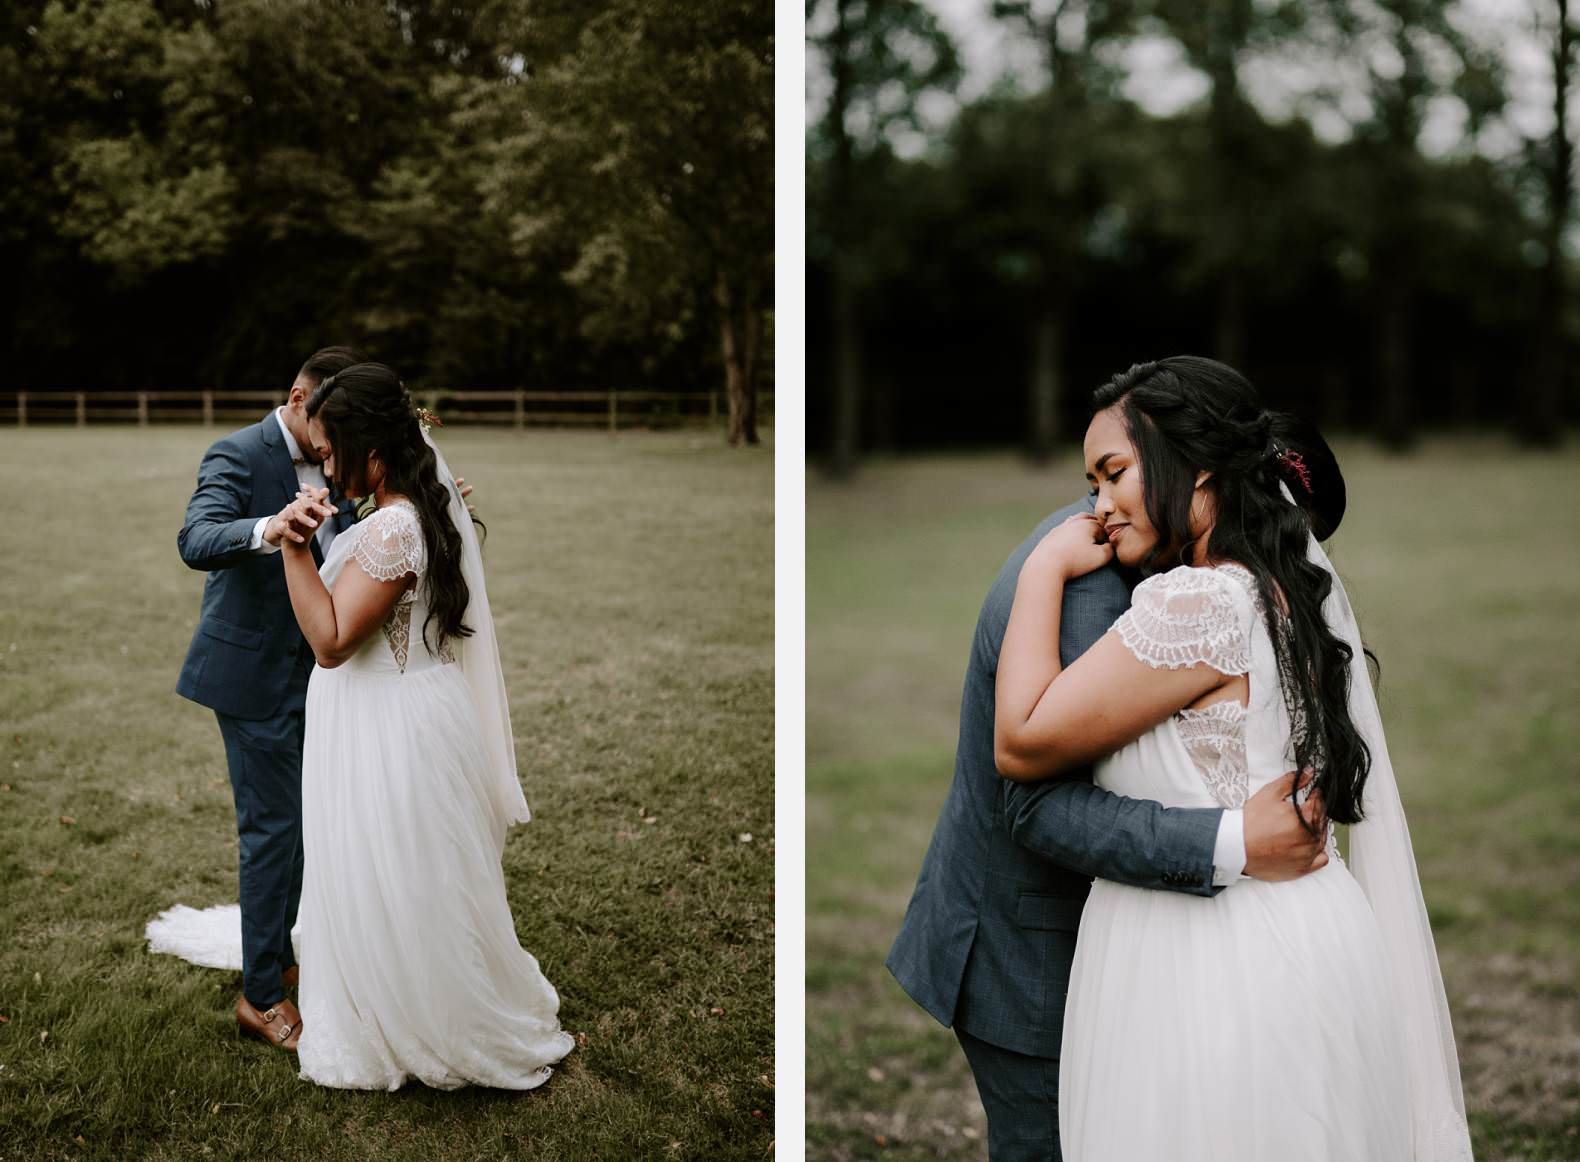 mariage manoir de corny photographe bel esprit 0055 1